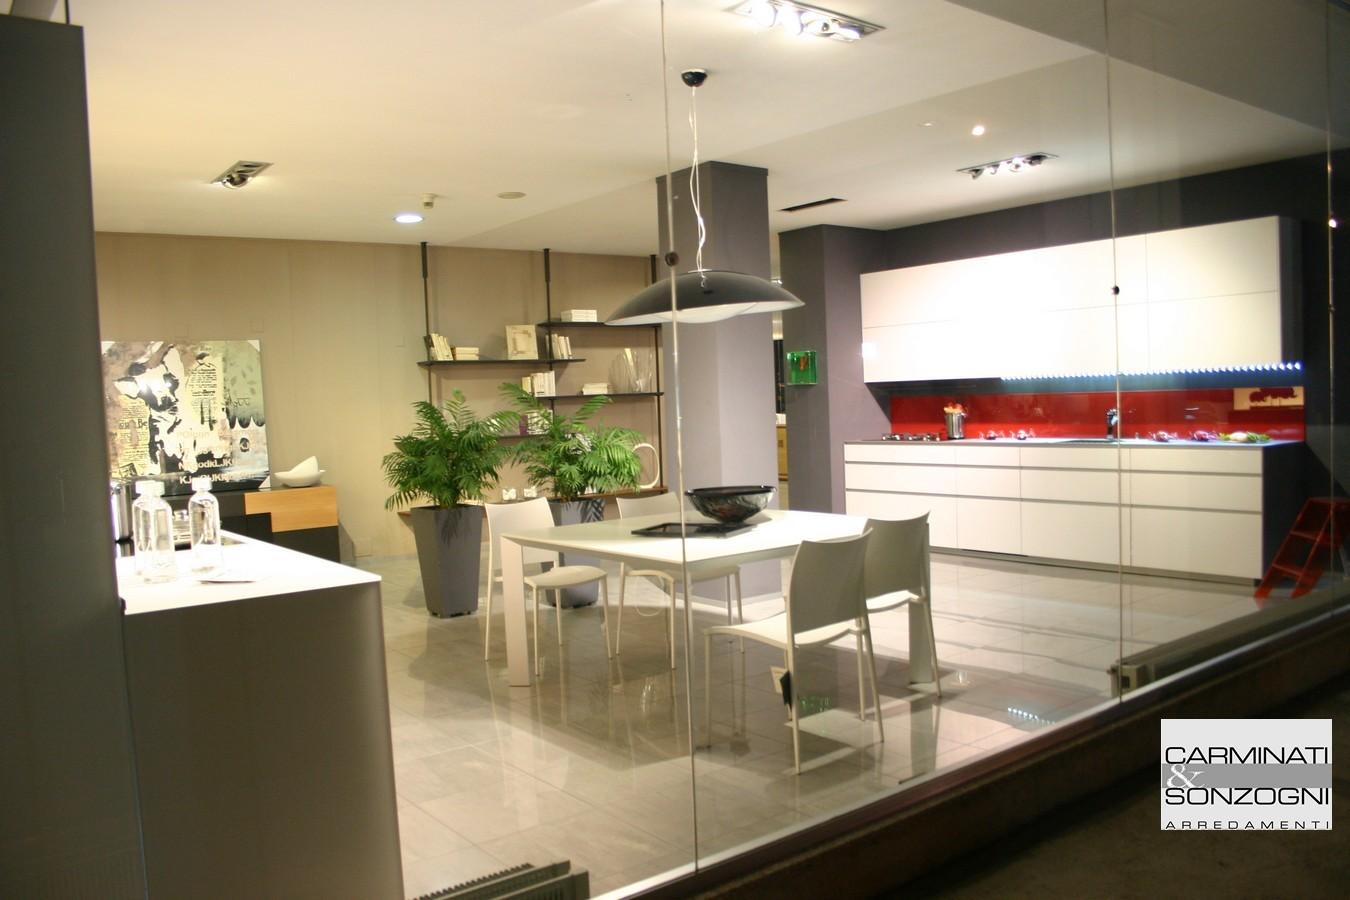 vista esterno vetrina con cucina Riciclantica Valcucine e tavolo Desalto a Zogno Bergamo.jpg